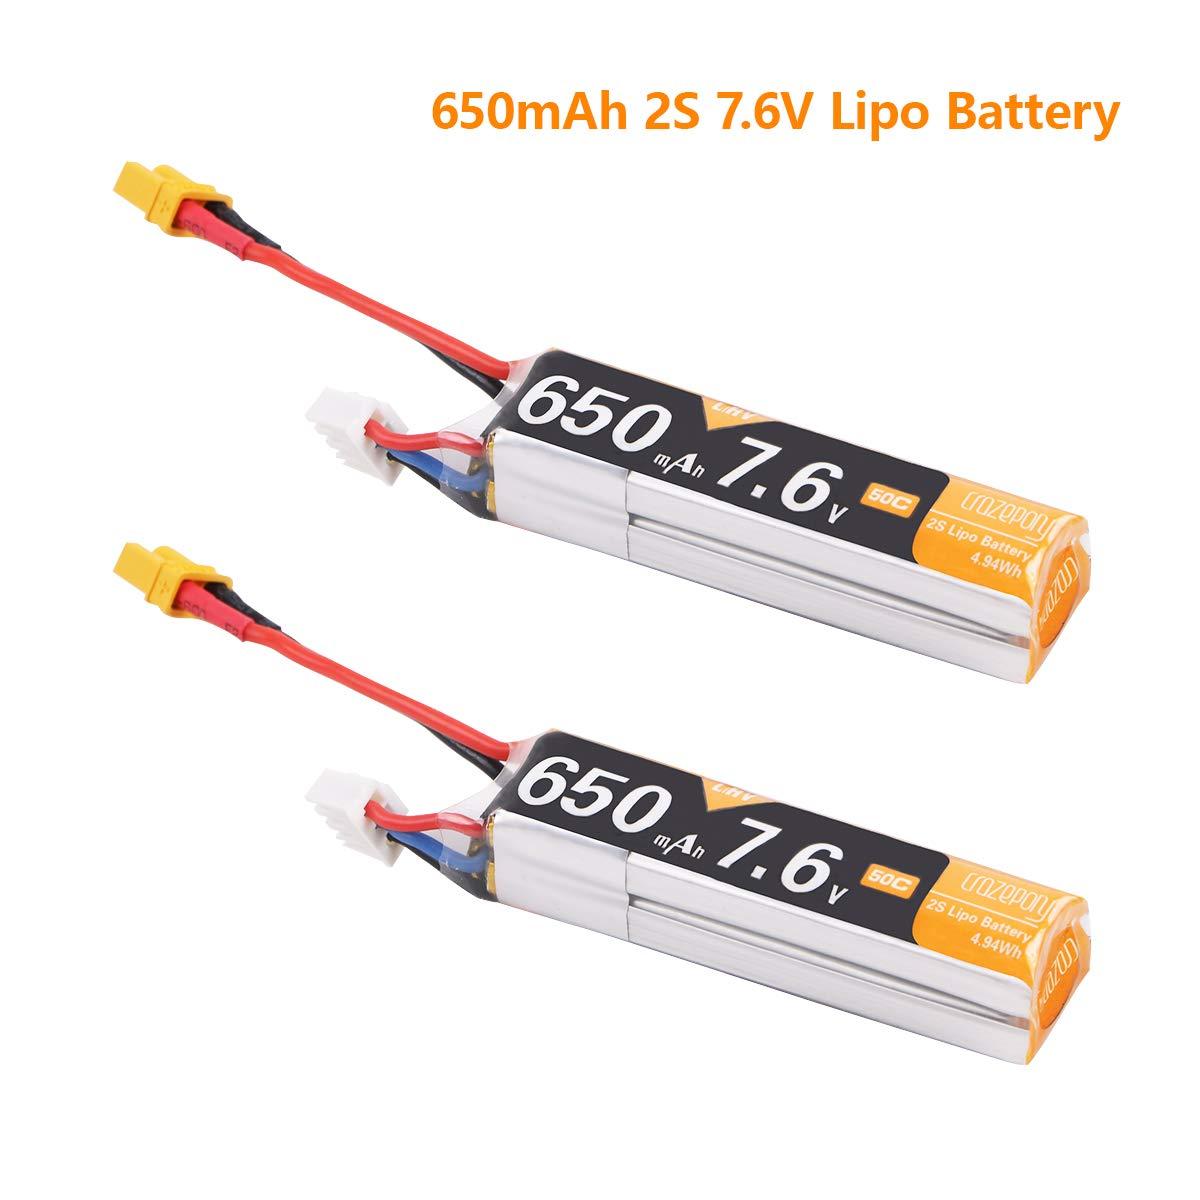 Baterias LIPO (2) 7.6V 650mah RC MAKERFIRE